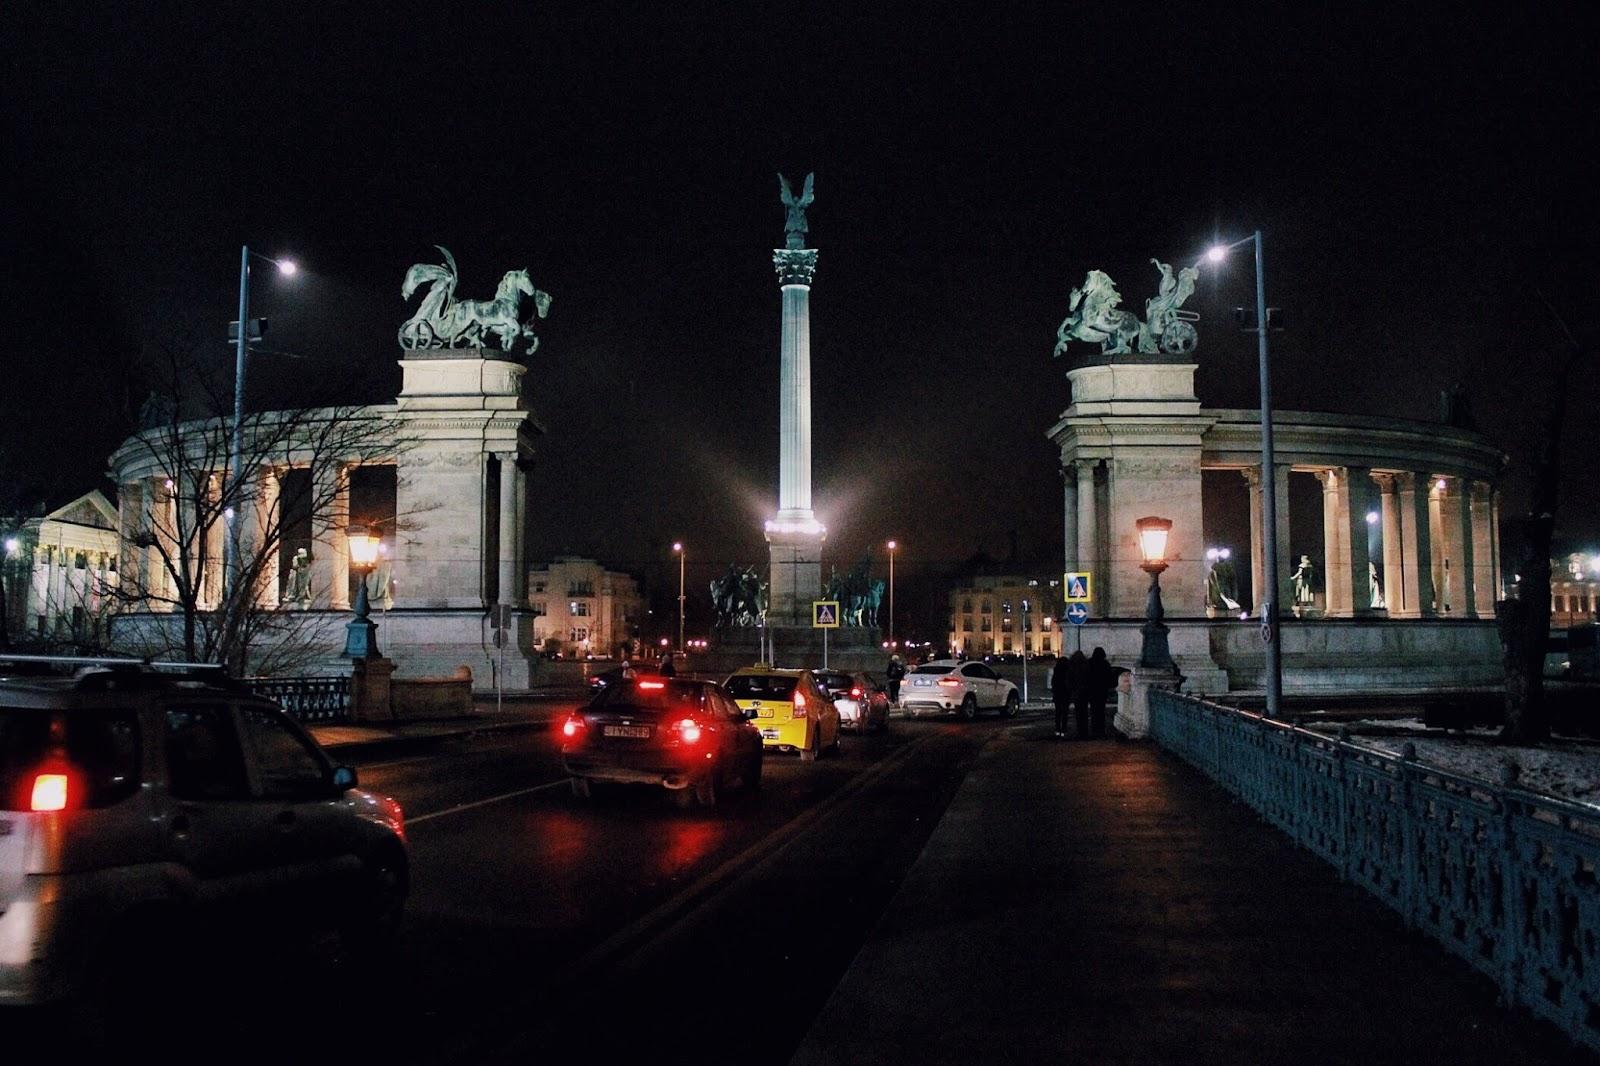 lifesthayle-budapest-heroes-square.jpg